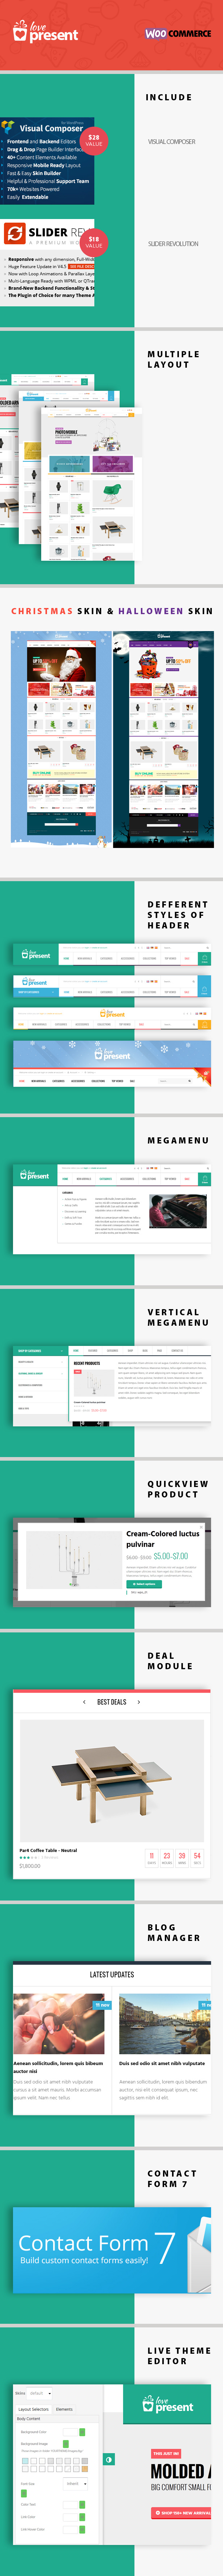 Present - Pro GiftShop WordPress Theme